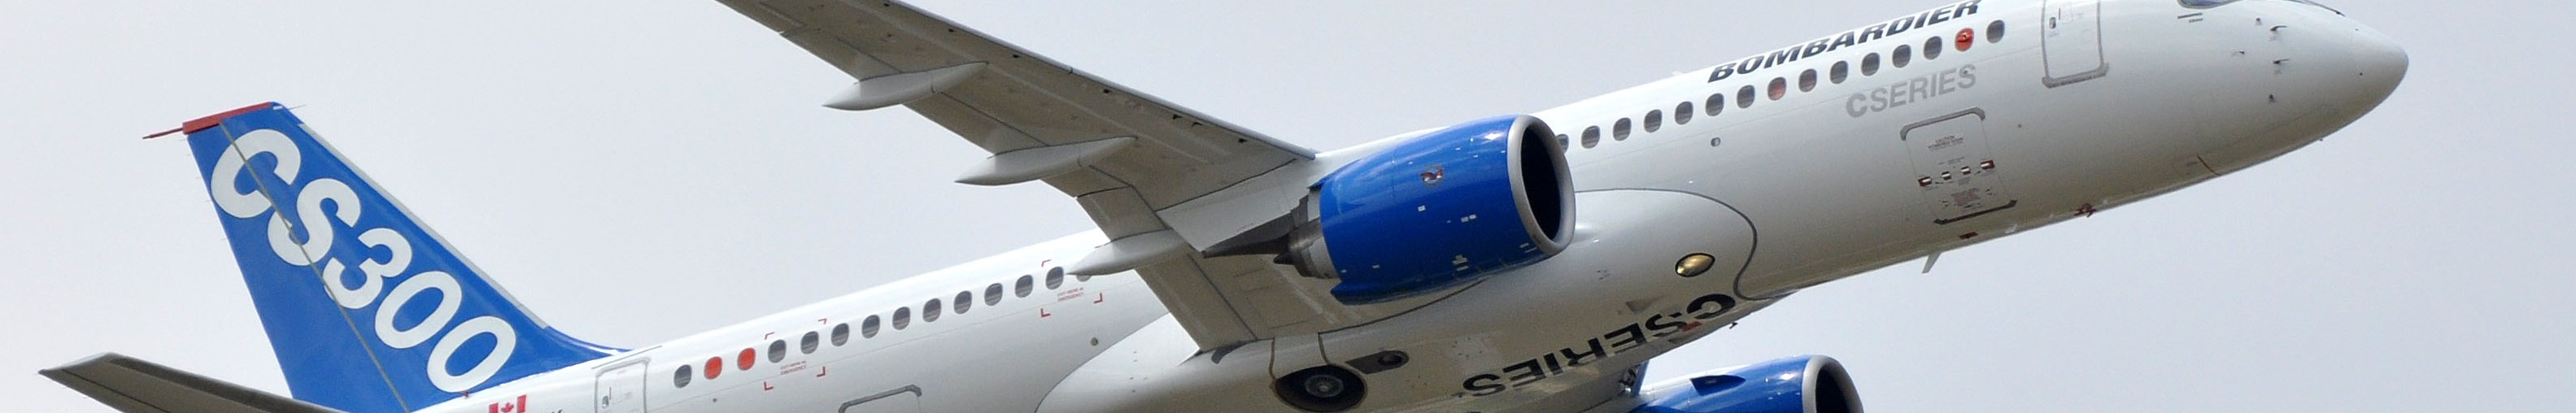 Bombardier,_BD-500_CSeries_CS300,_C-FFDK_(18777967098)